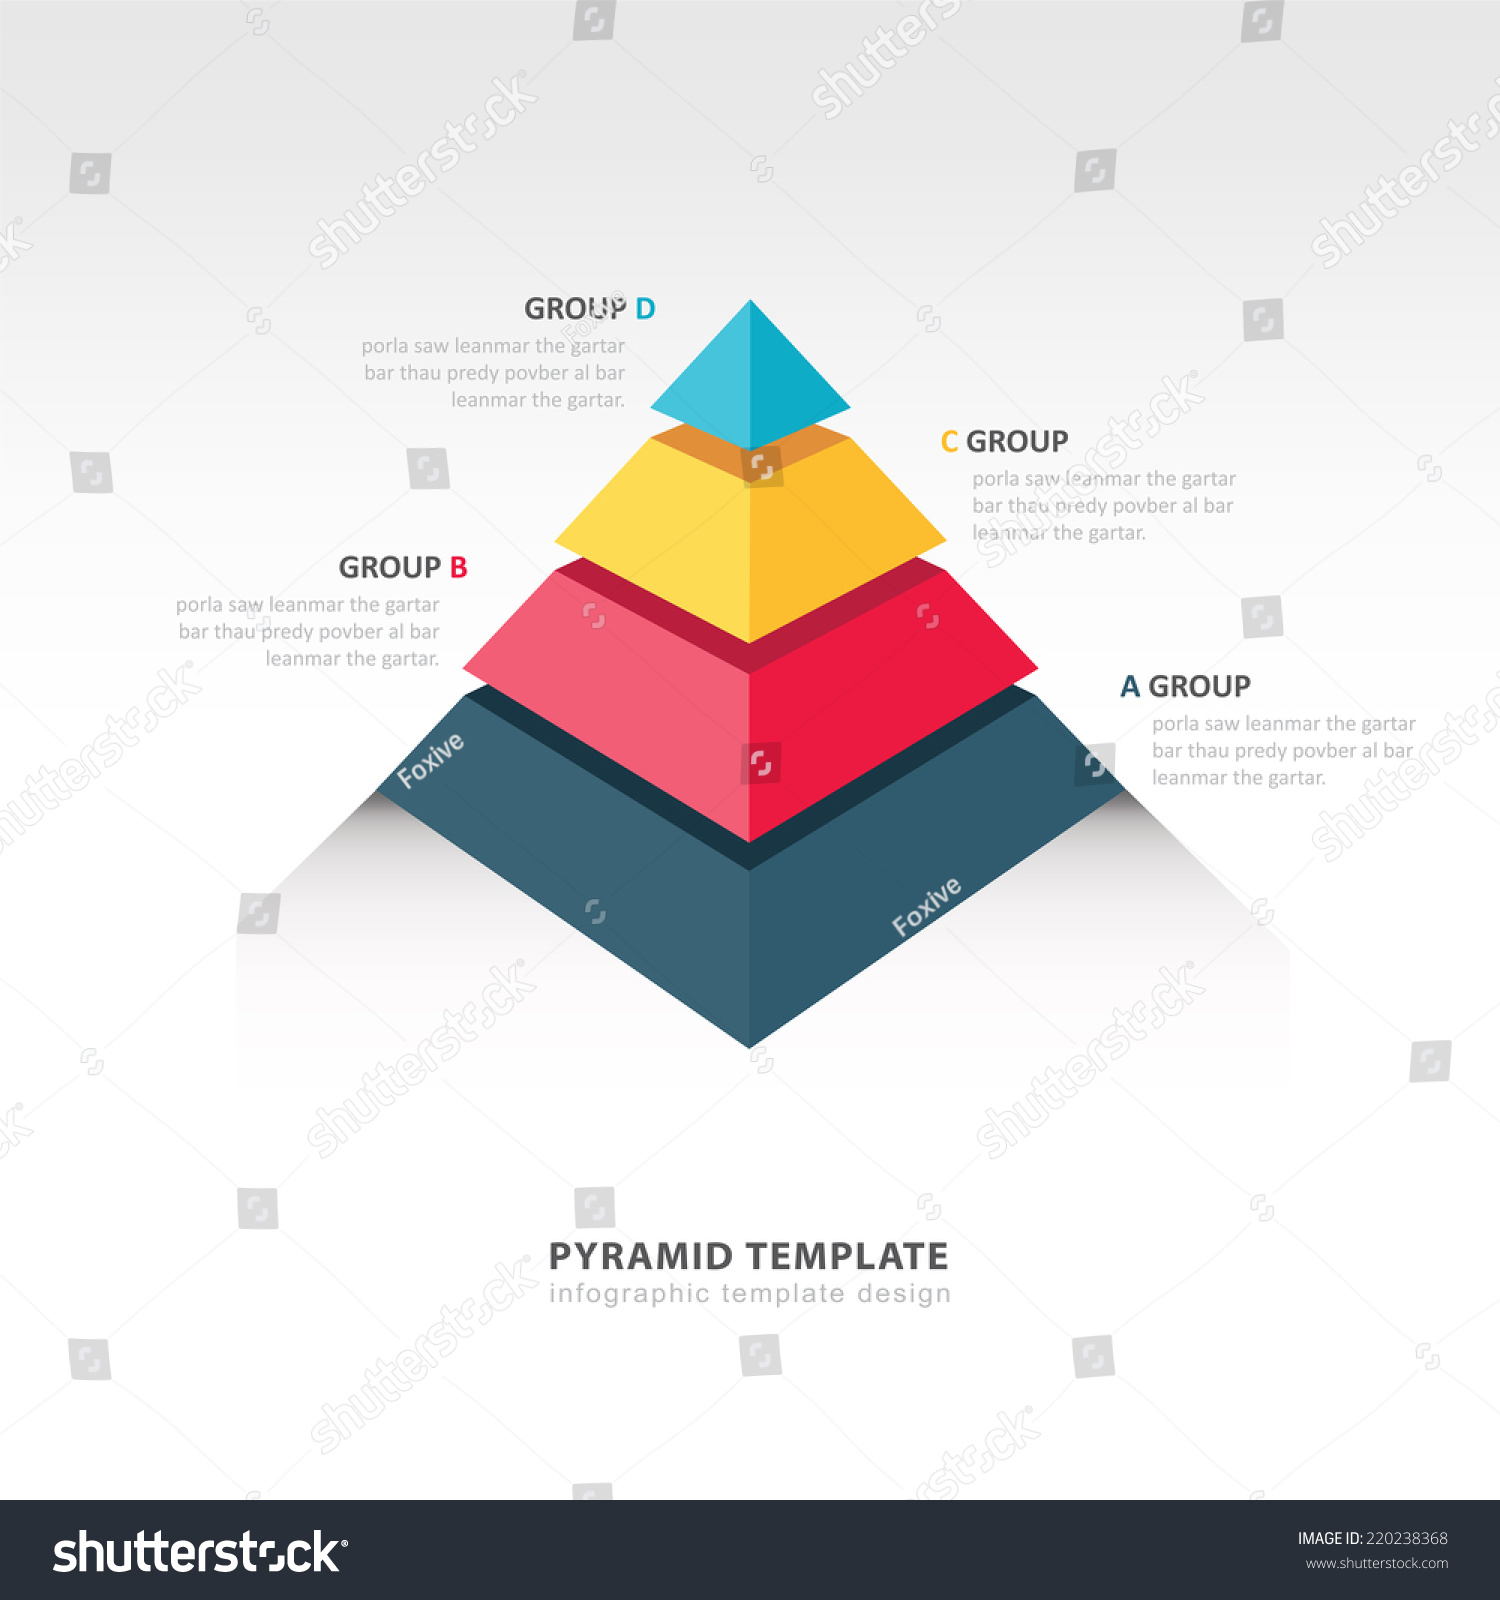 pyramid infographic template のベクター画像素材 ロイヤリティフリー